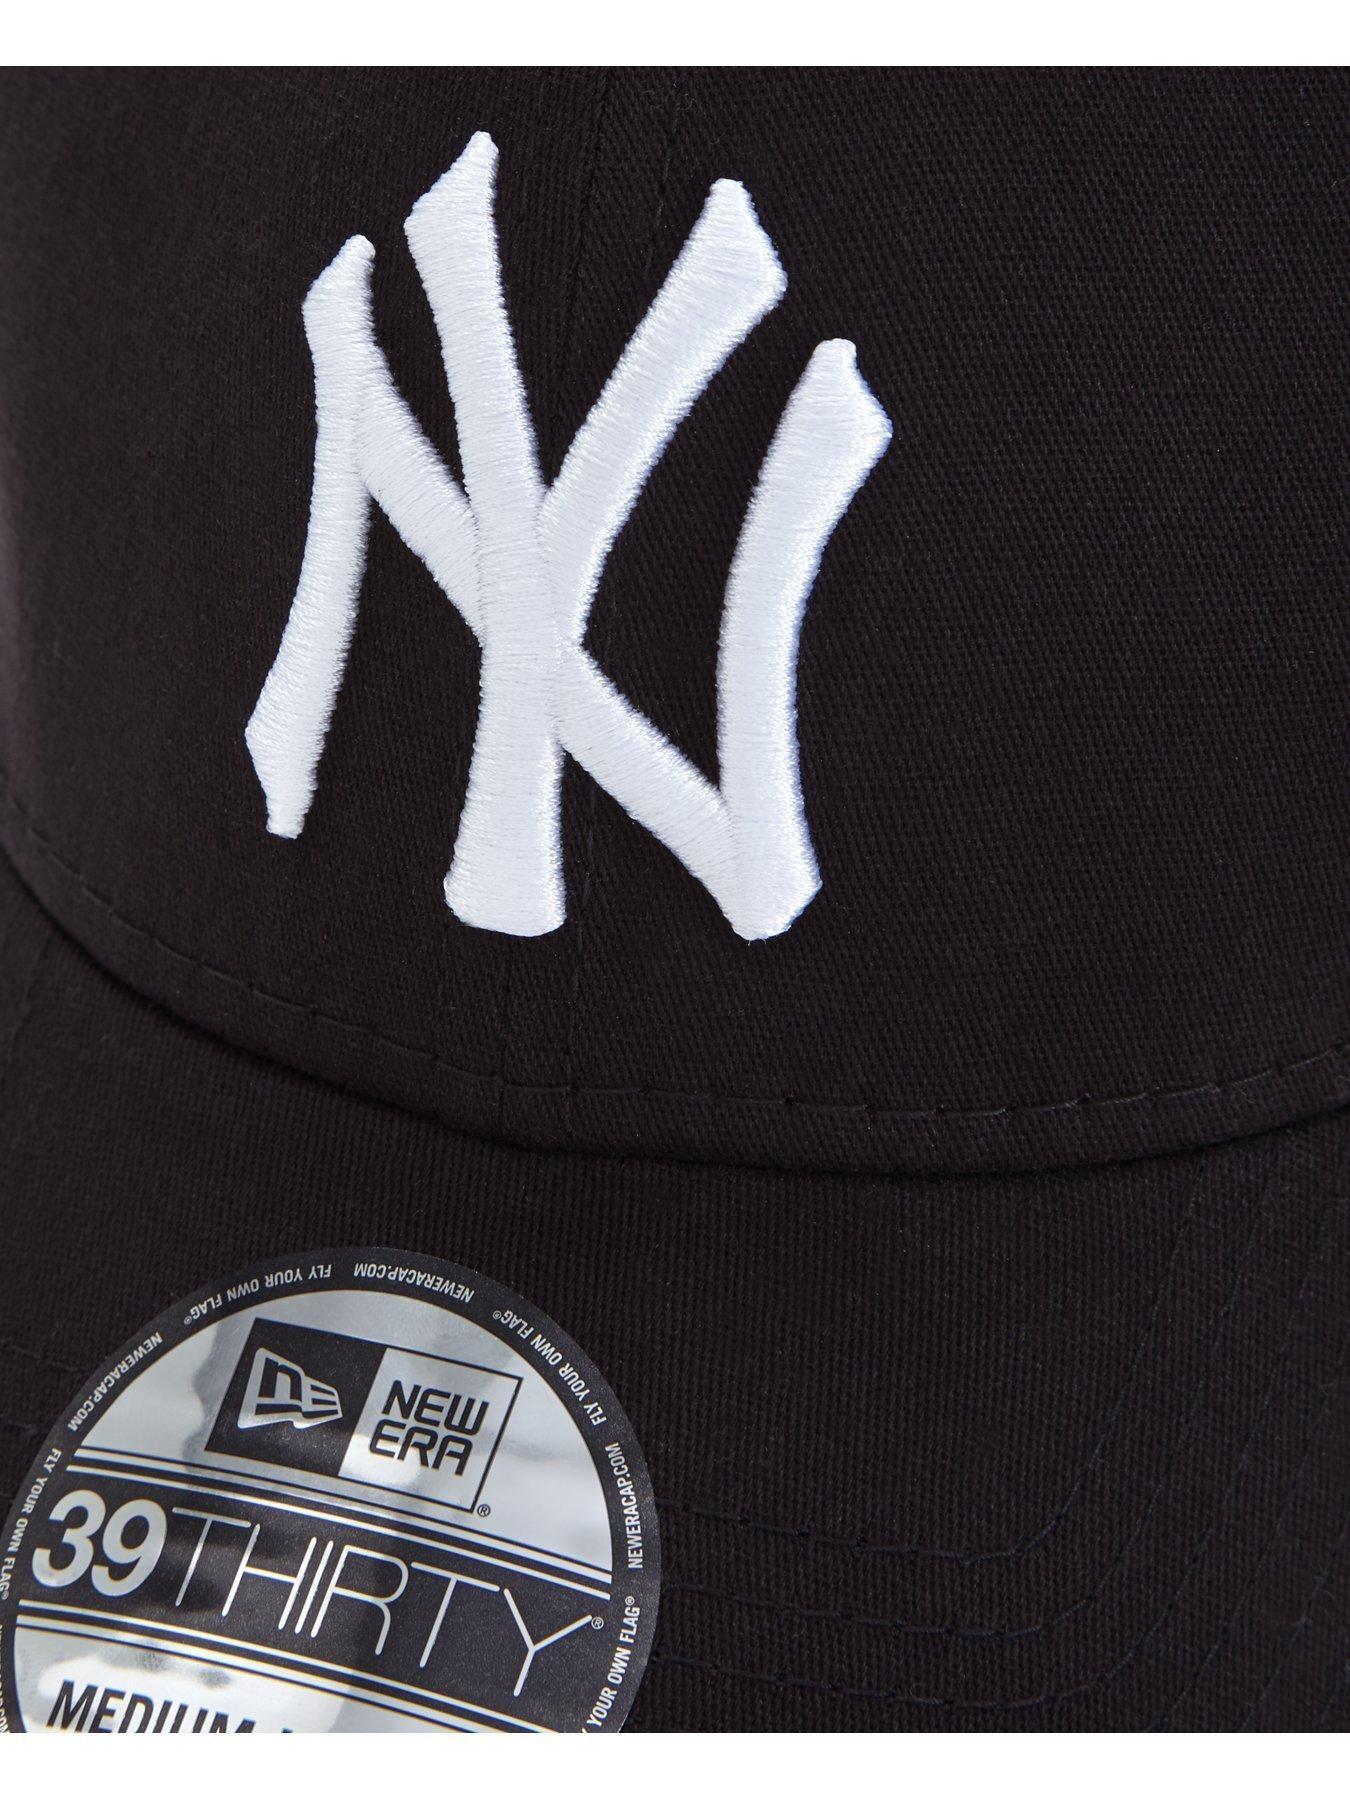 New Era New York Yankees Stretch Fit Cap Black Size M L Men Black M L New York Yankees Fitted Caps New Era Logo